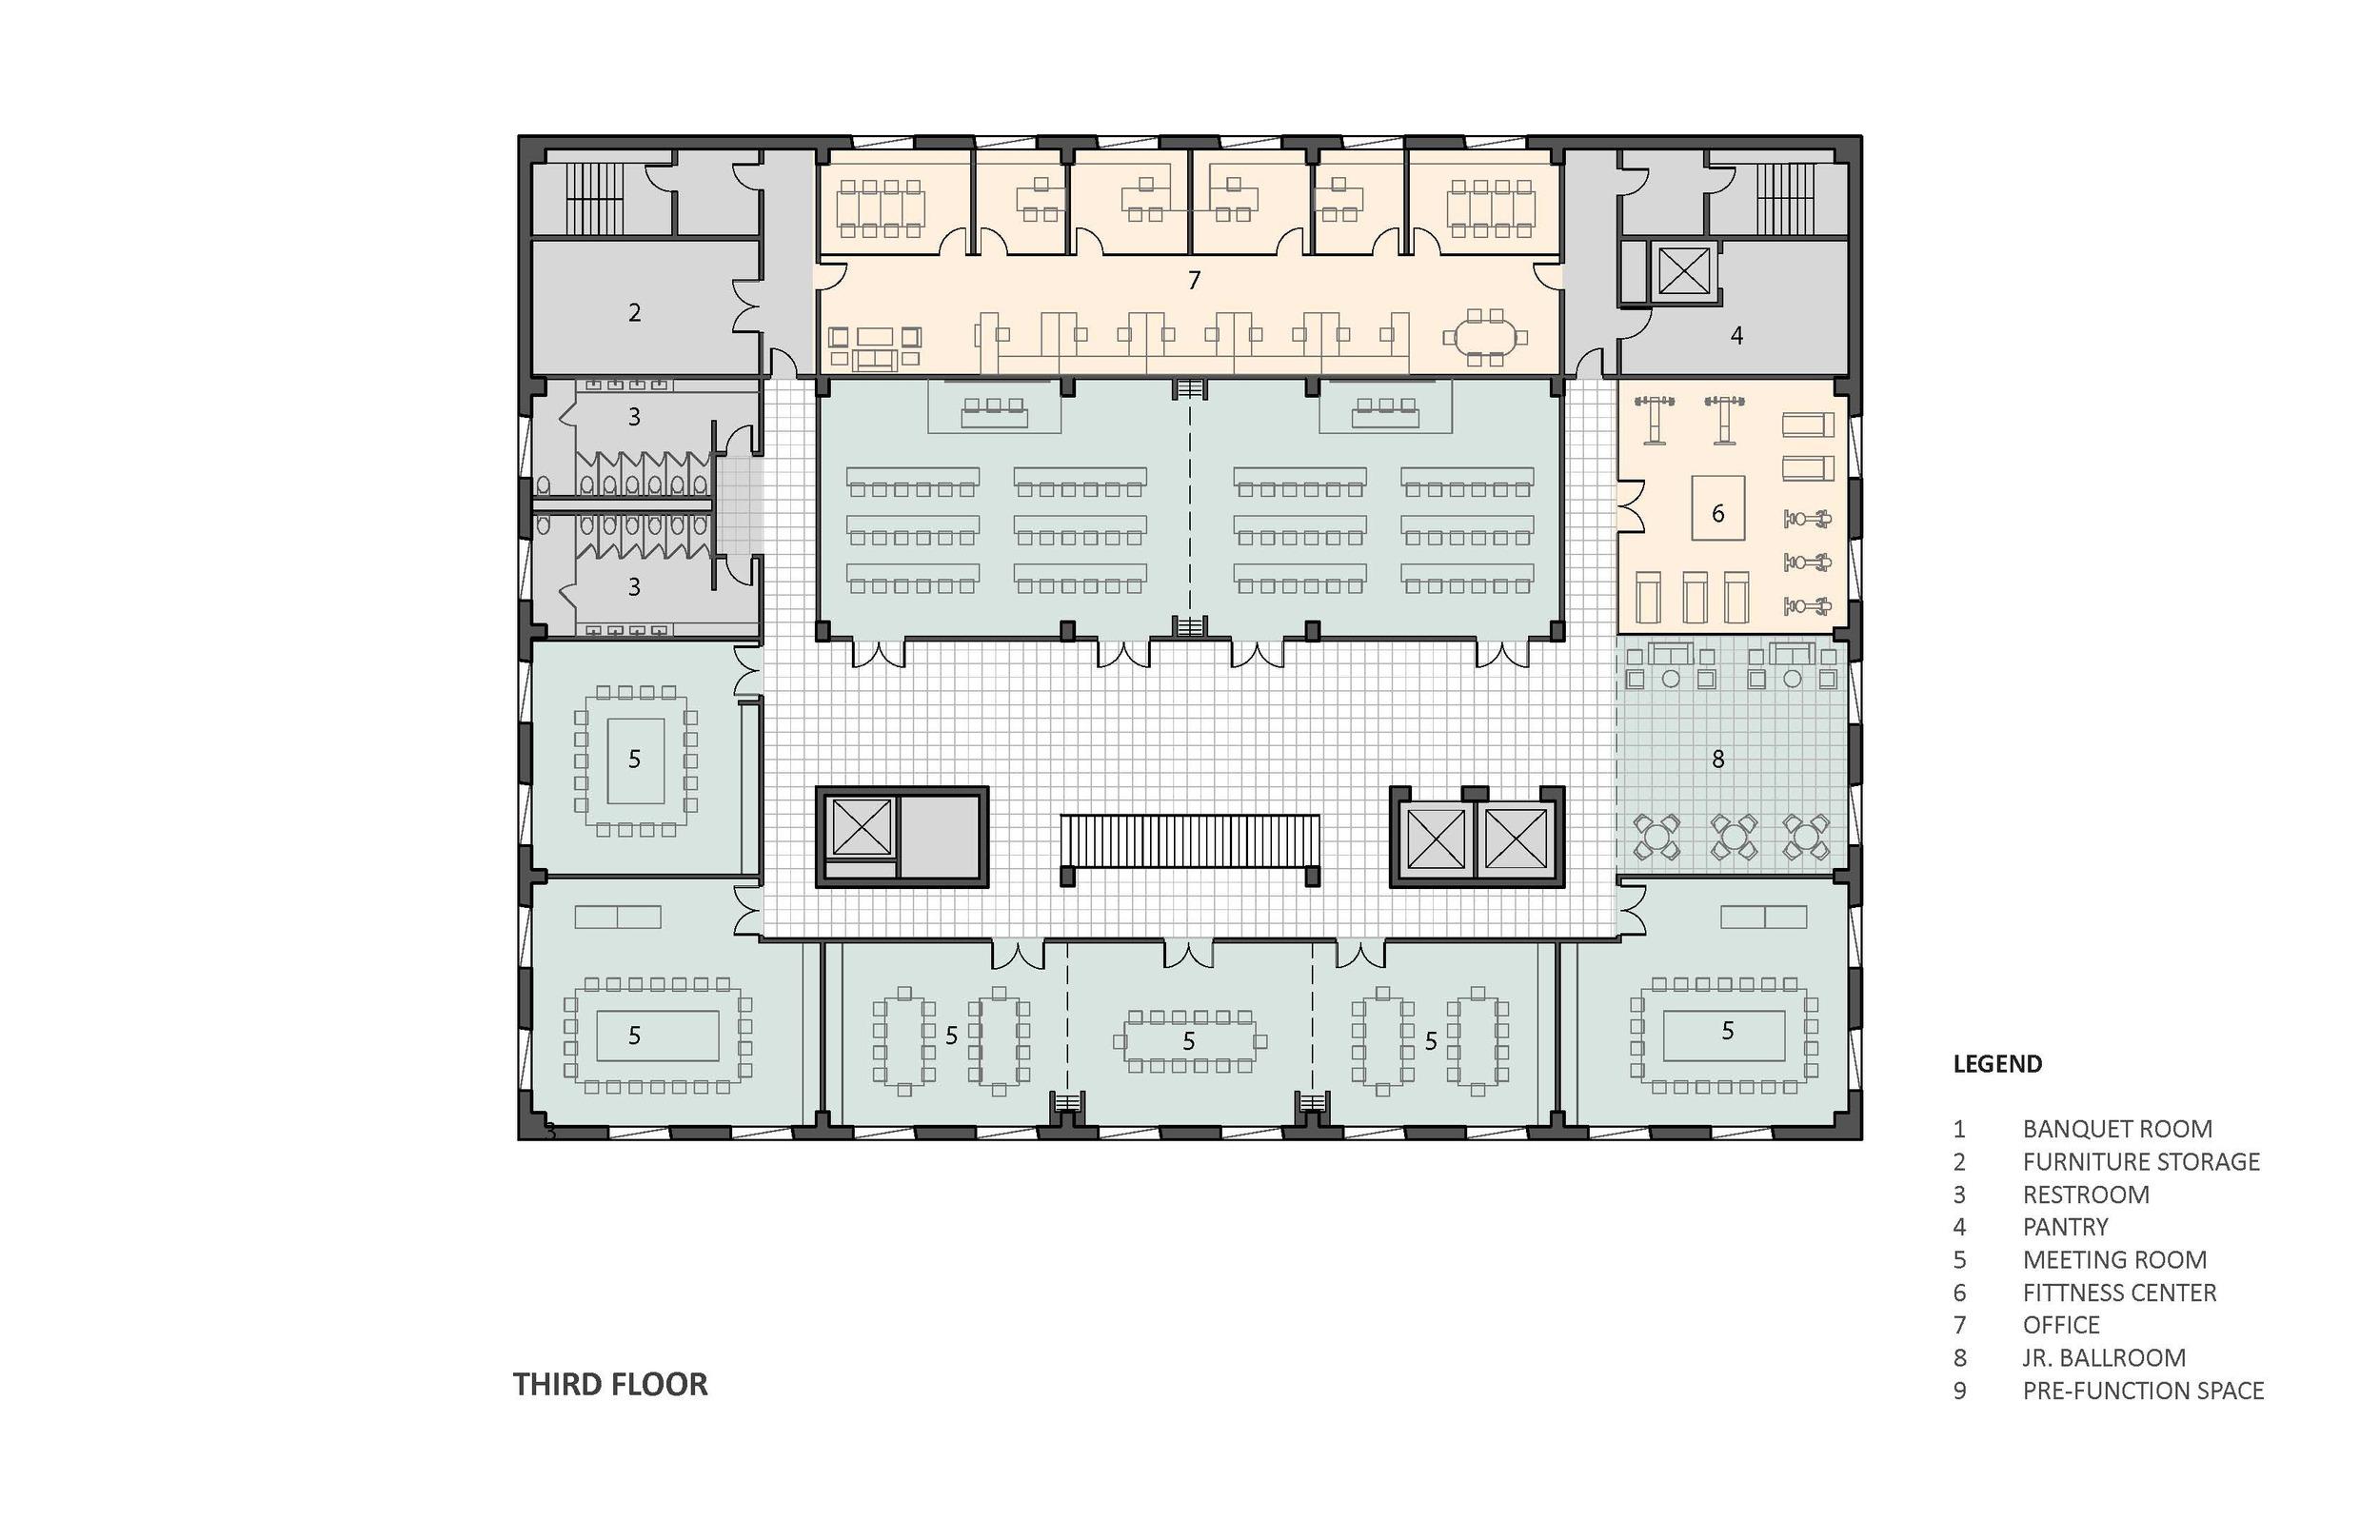 16_0301_03 Third Floor with colors NO BALCONY.jpg